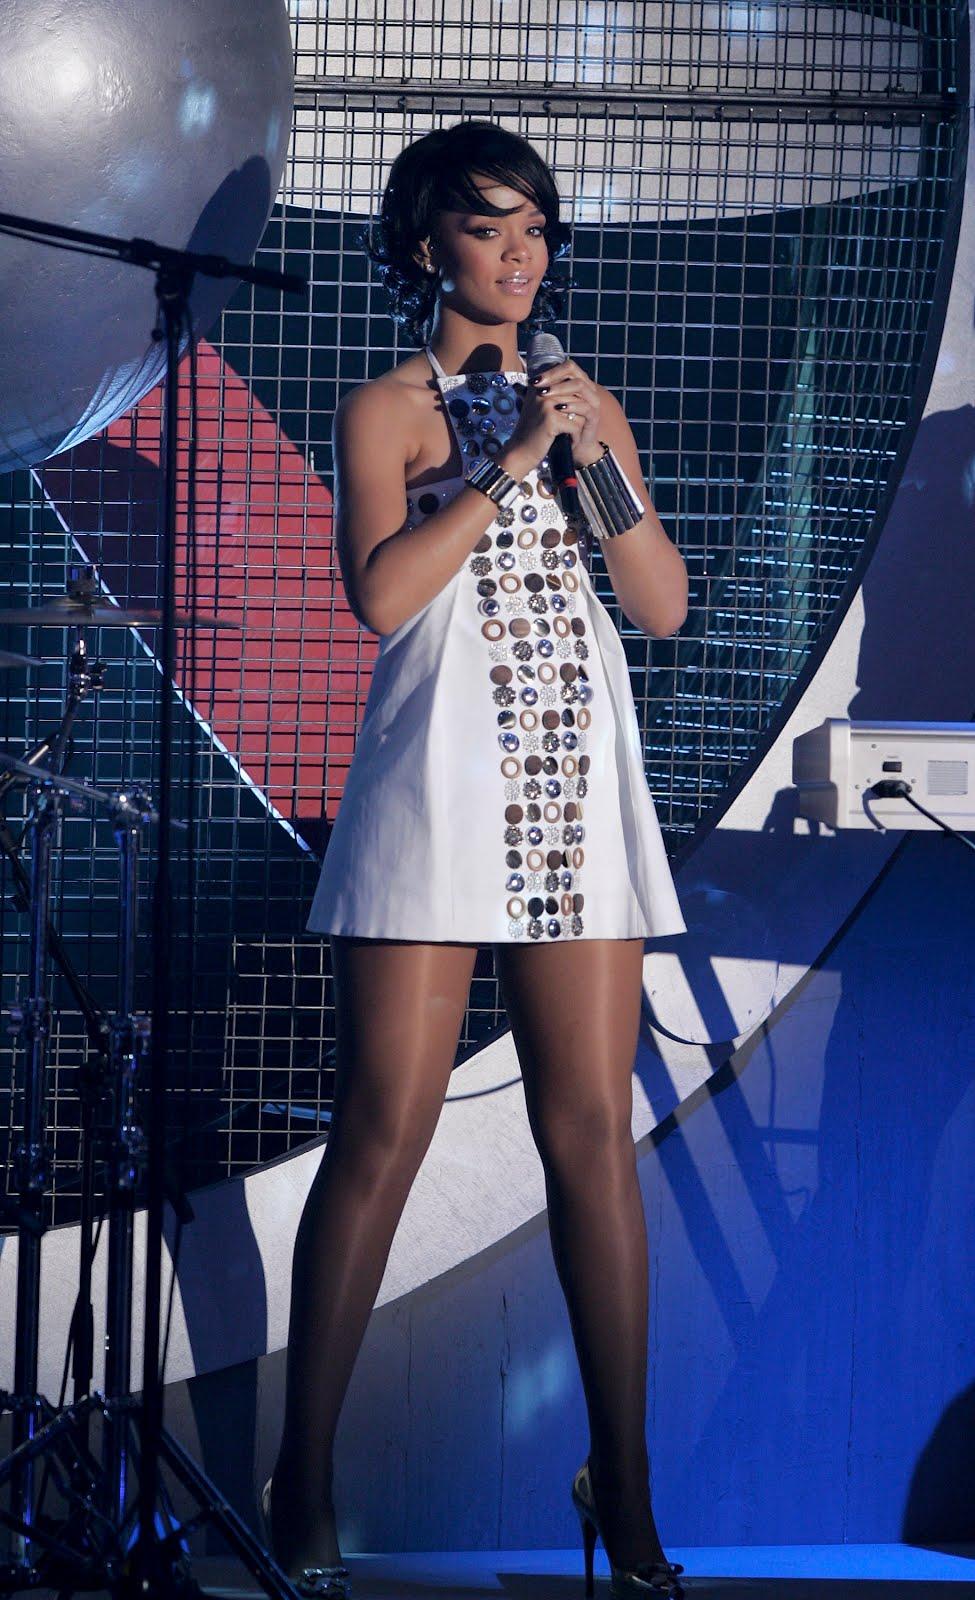 Rihanna In Pantyhose 110